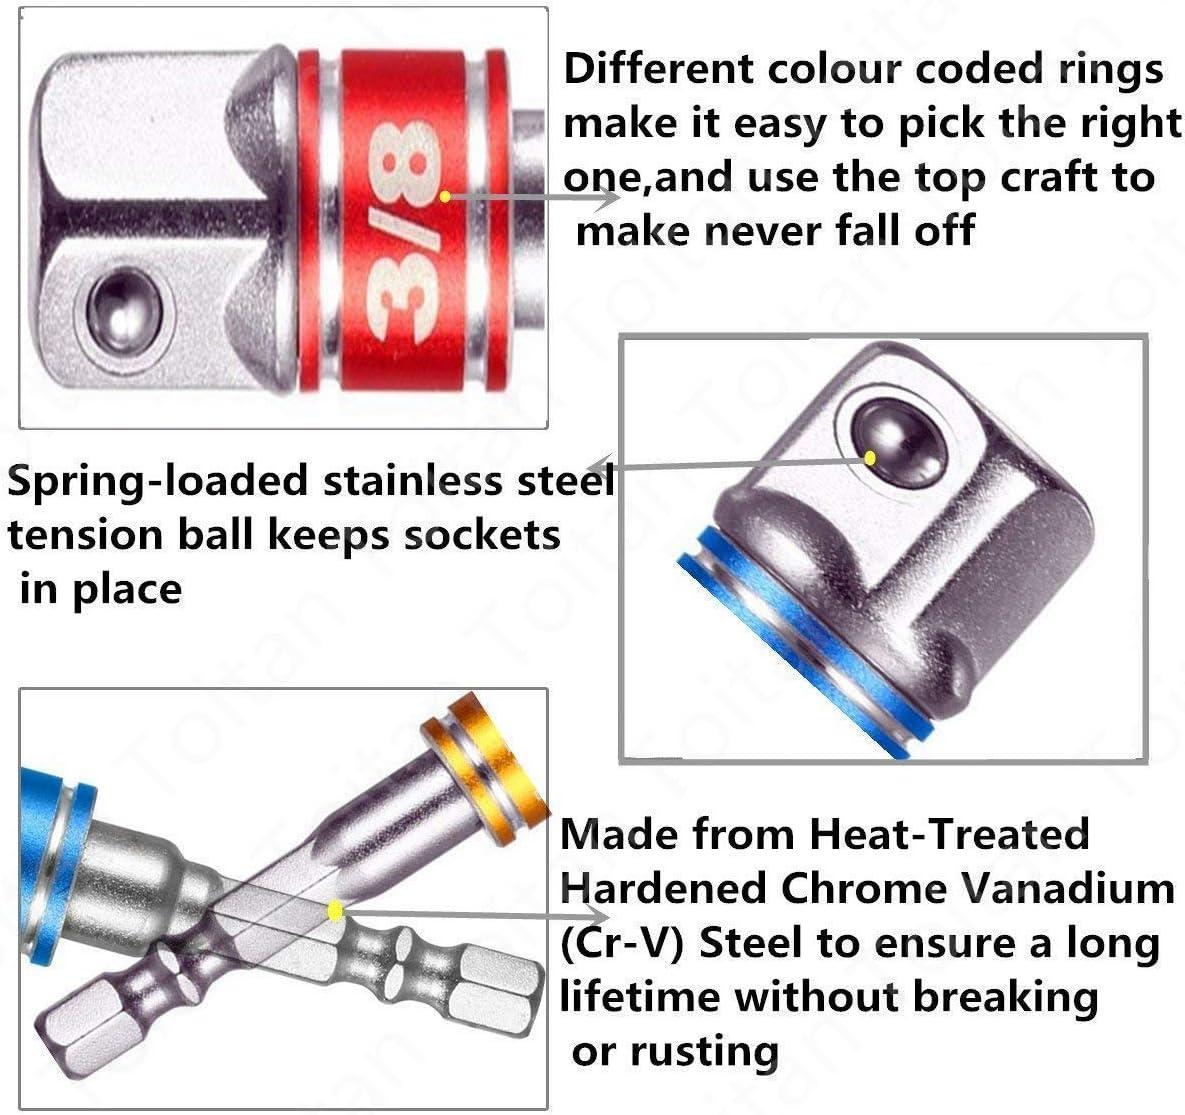 3Pcs 1//4 3//8 1//2Hex Shank Impact Grade Driver Socket Adapter Drill Bit Set+105 Right Angle Drill Degree Adapter Attachment 1//4 Drive 6mm Hex Magnetic Bit Socket Screwdriver Holder Adaptor